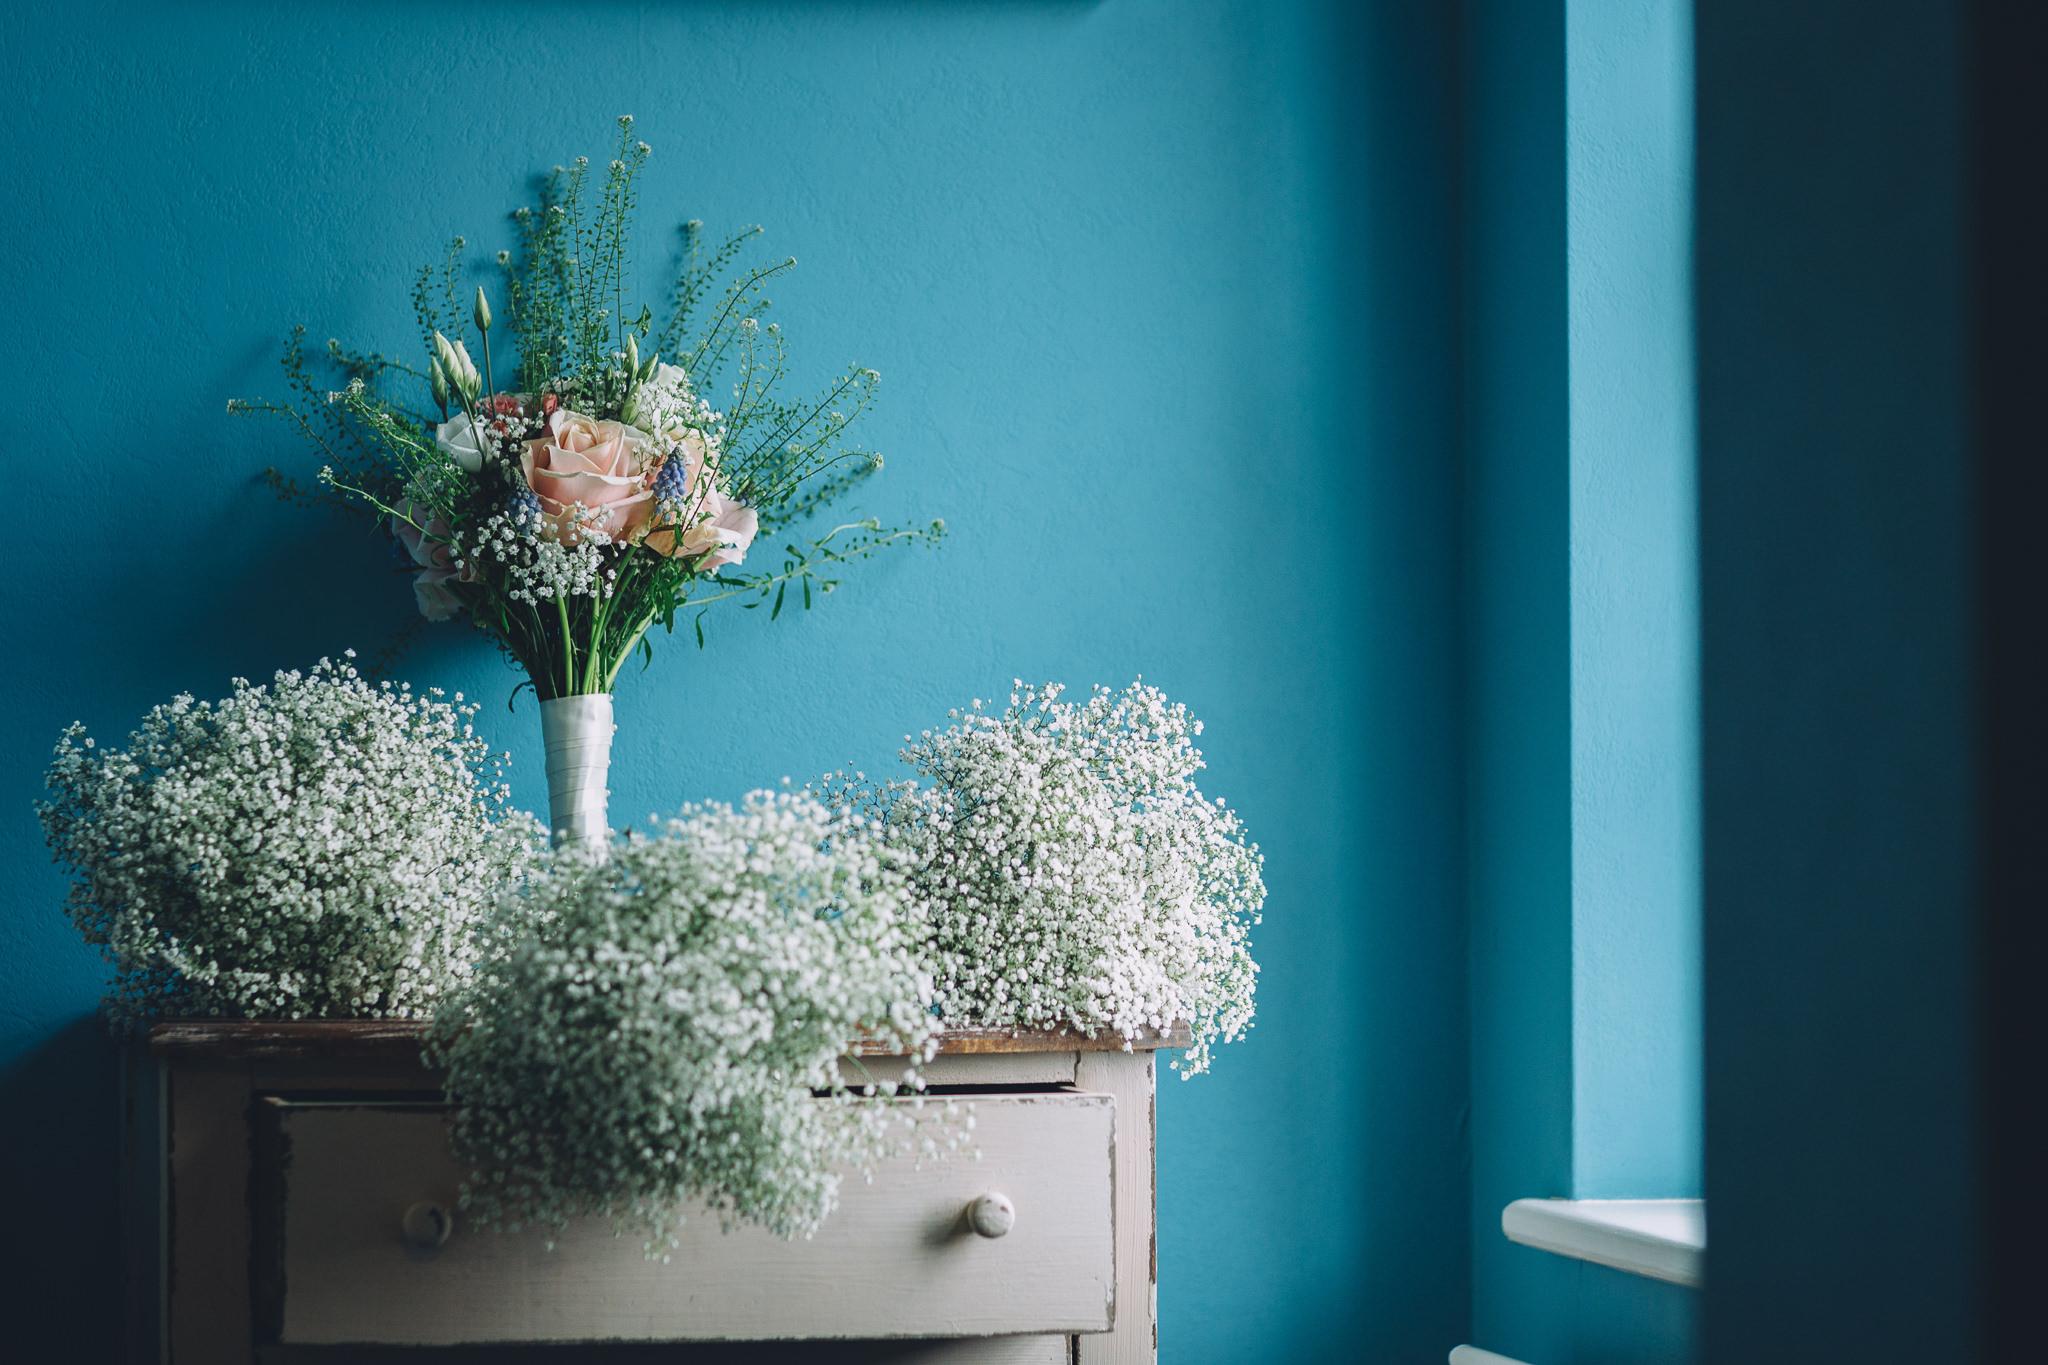 Creative-reportage-wedding-photography-90012